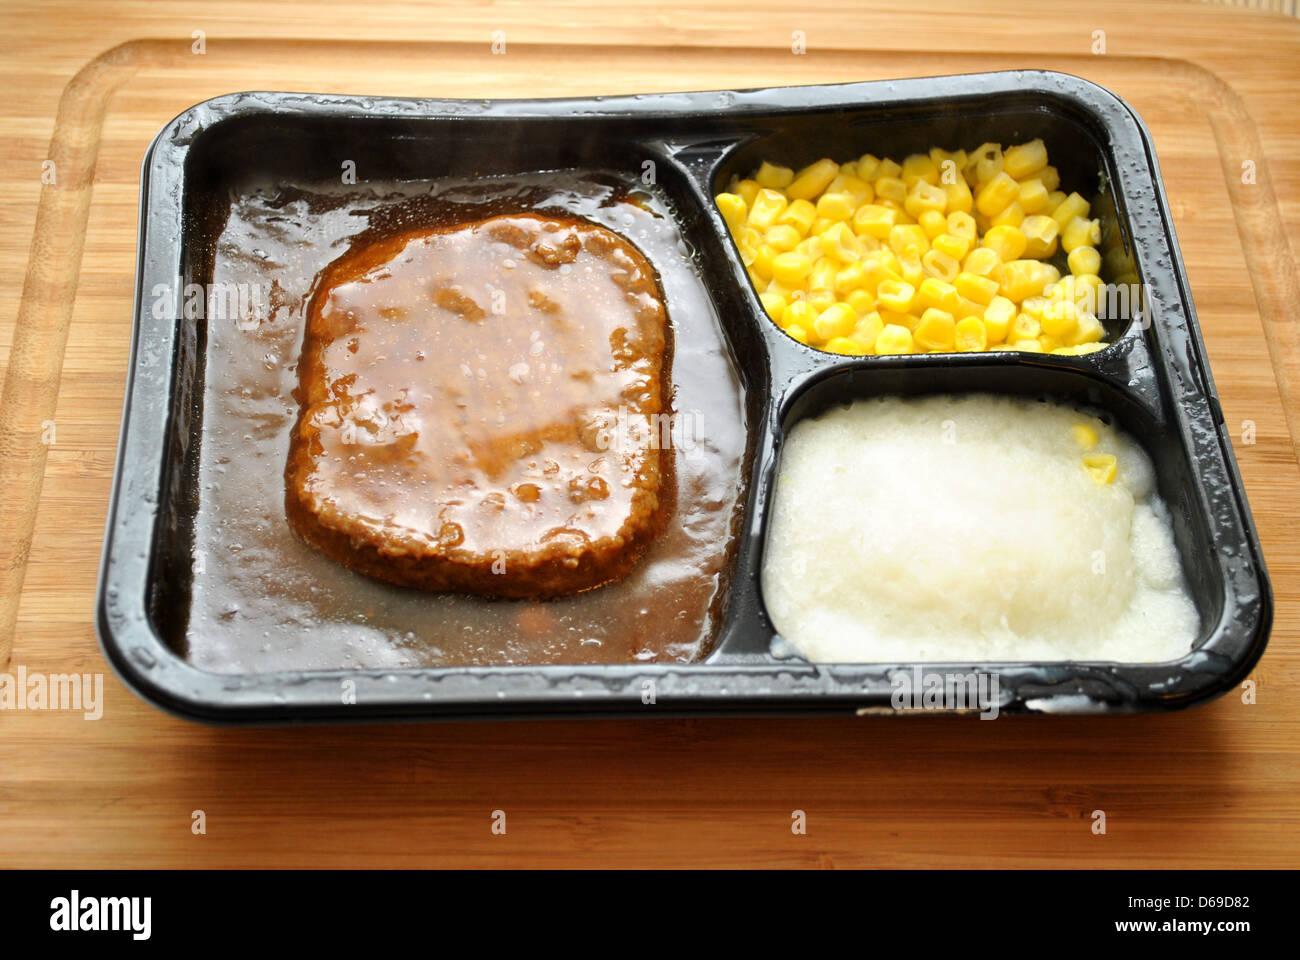 Salisbury Steak TV Dinner with Corn and Potatoes - Stock Image